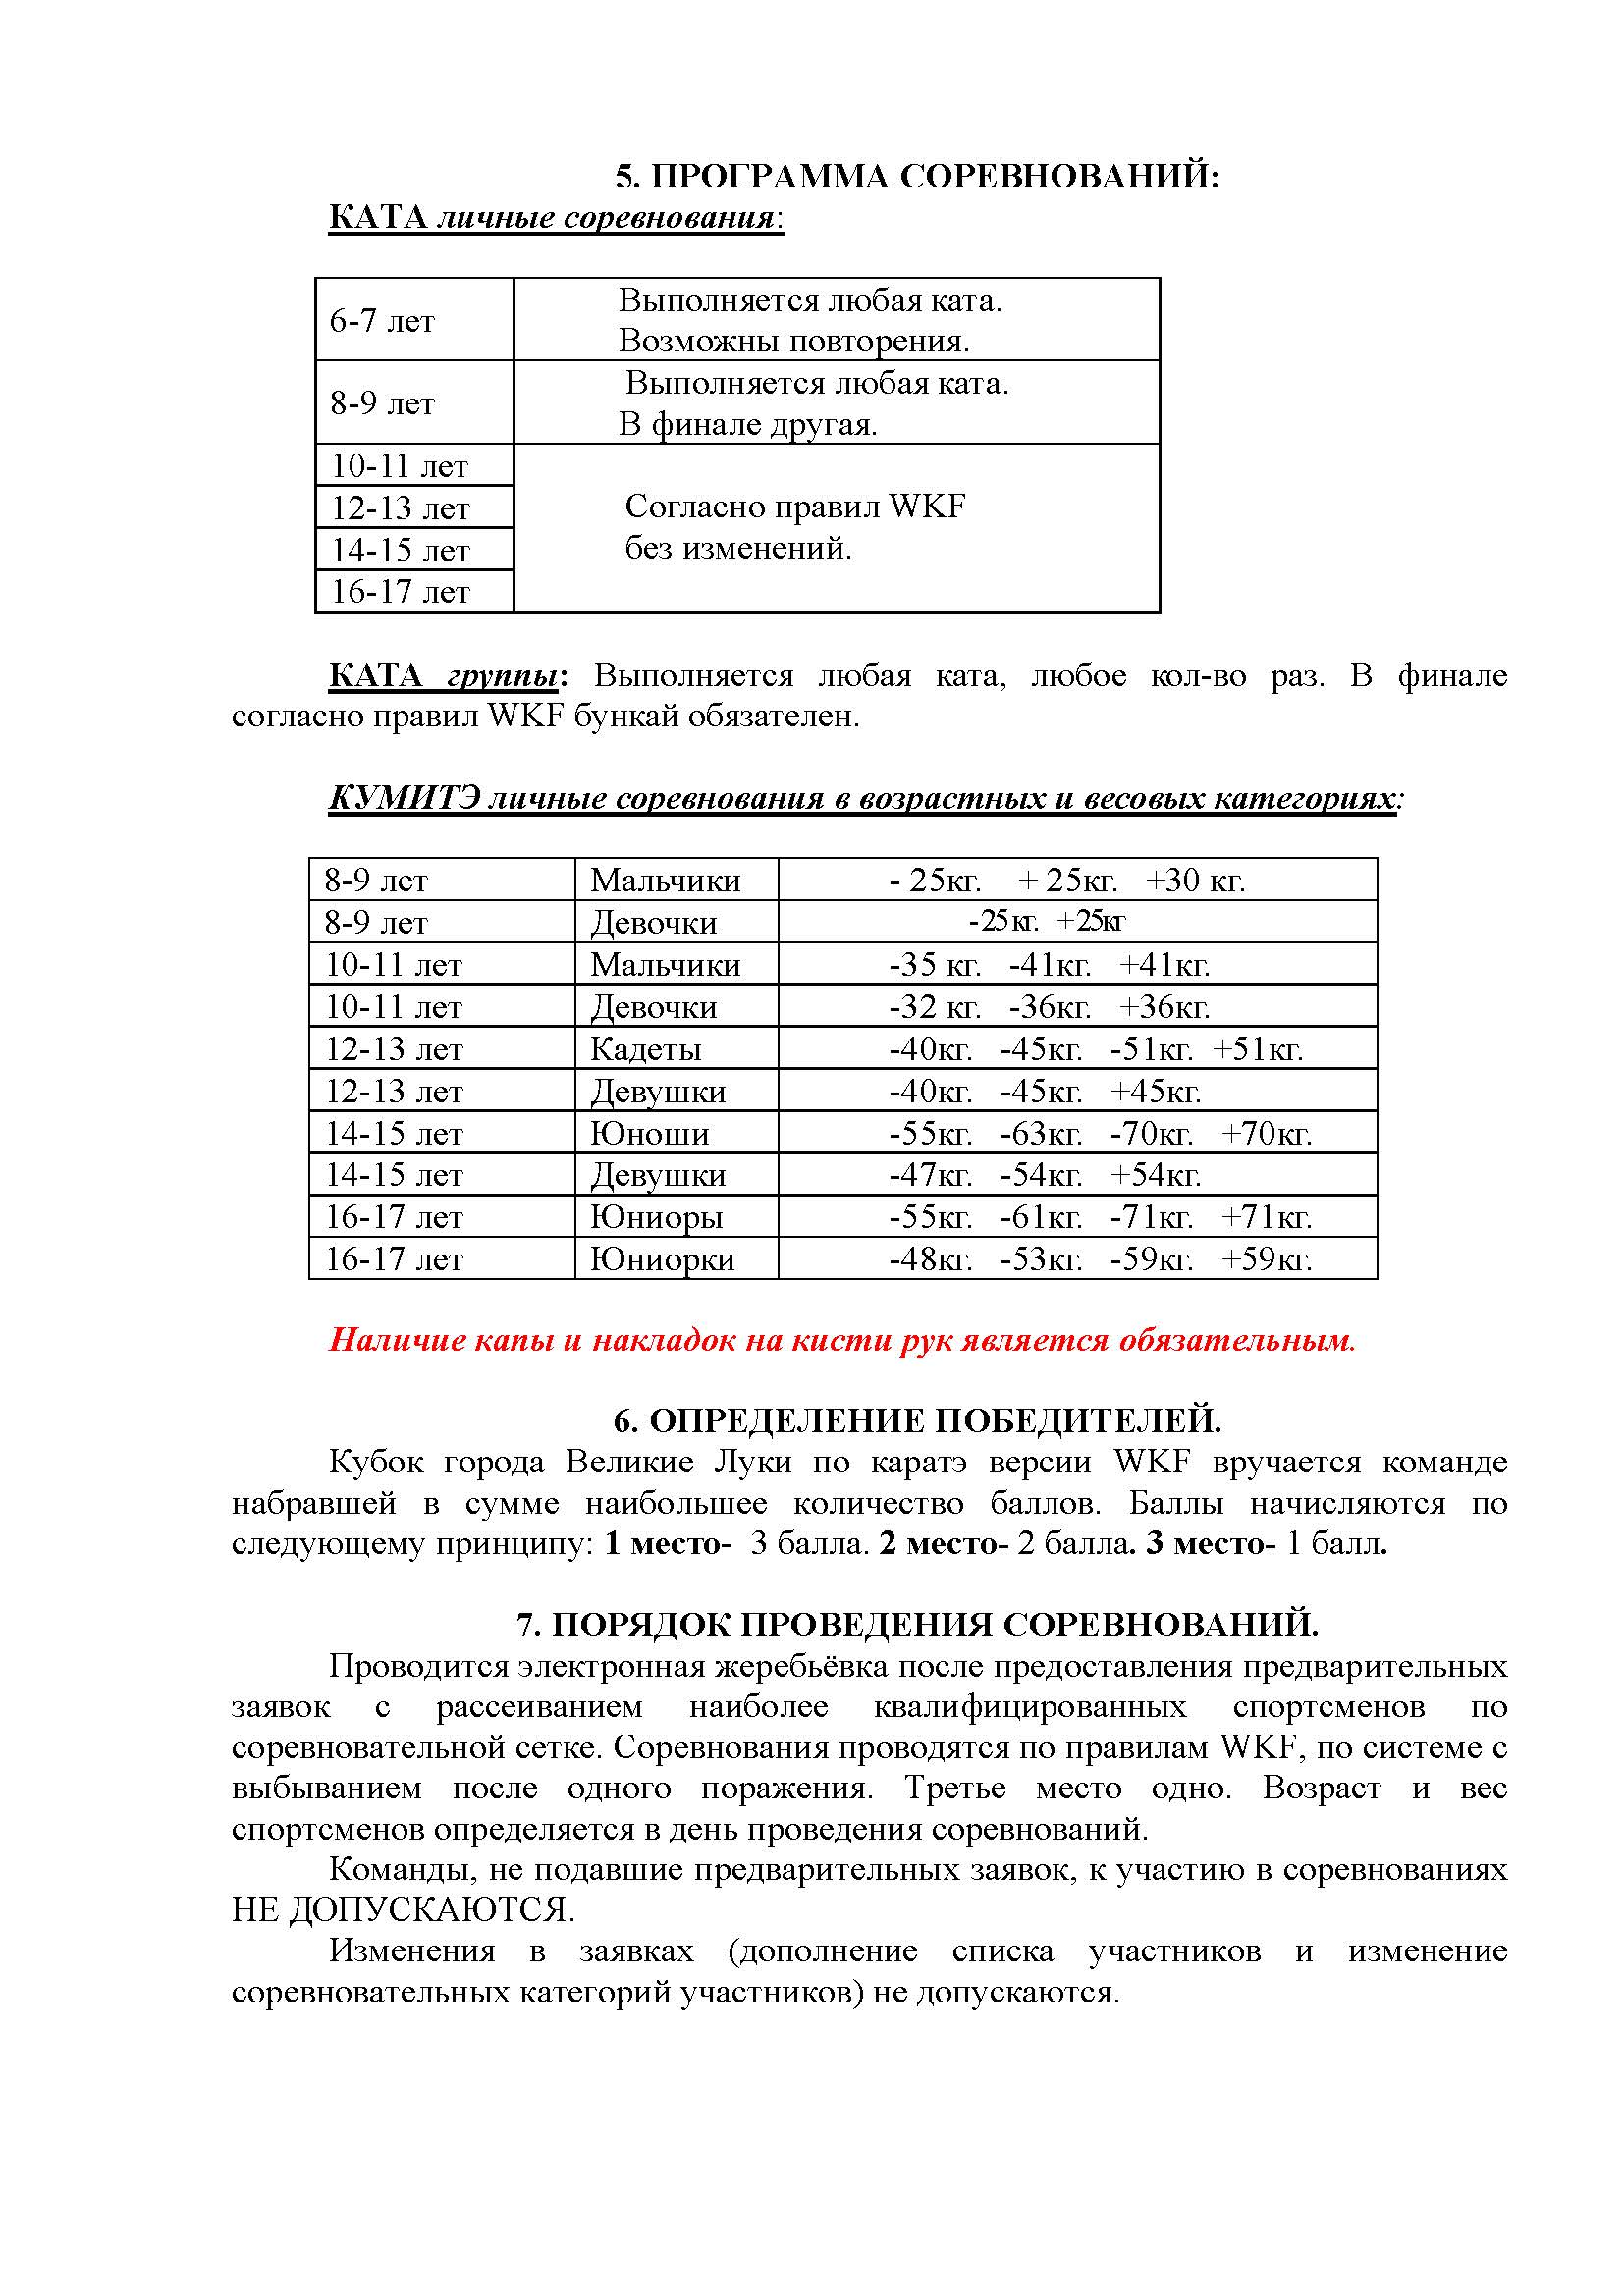 Кубок каратэ г. Великие Луки 2018_Страница_2